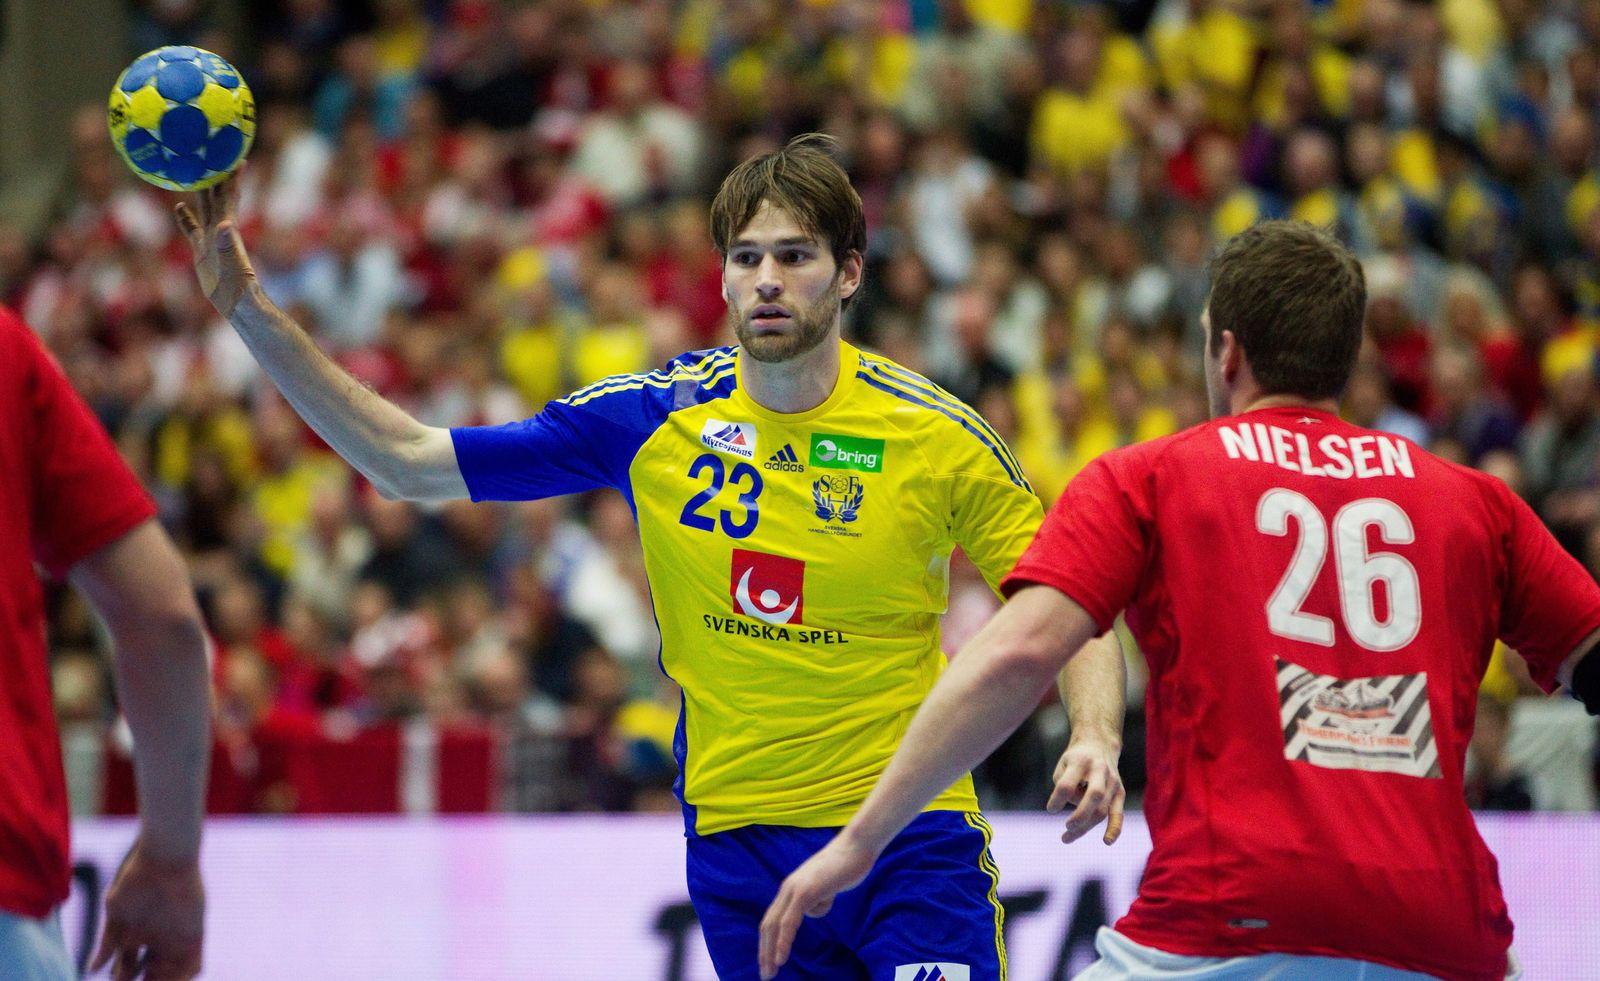 Fredrik Larsson gestorben